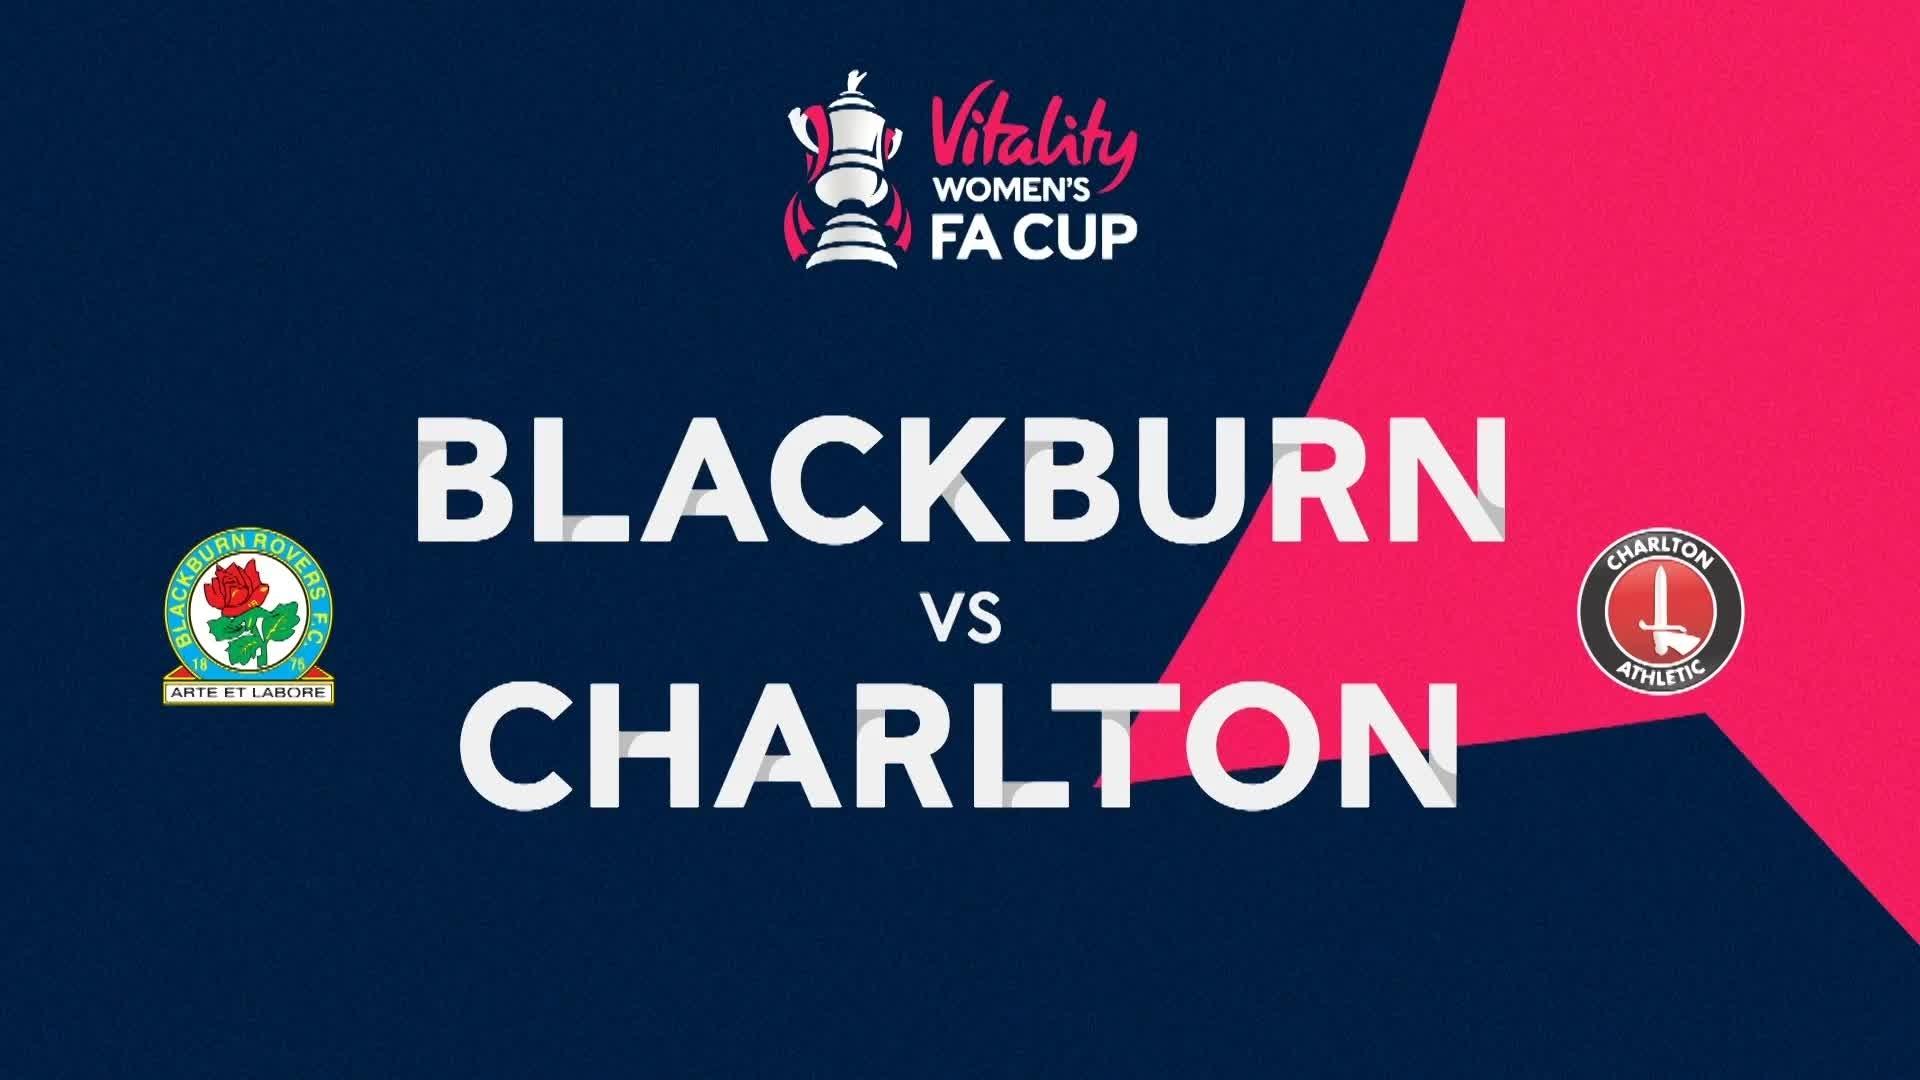 WOMEN'S TEAM | Blackburn Rovers 0 Charlton 1 (May 2021)